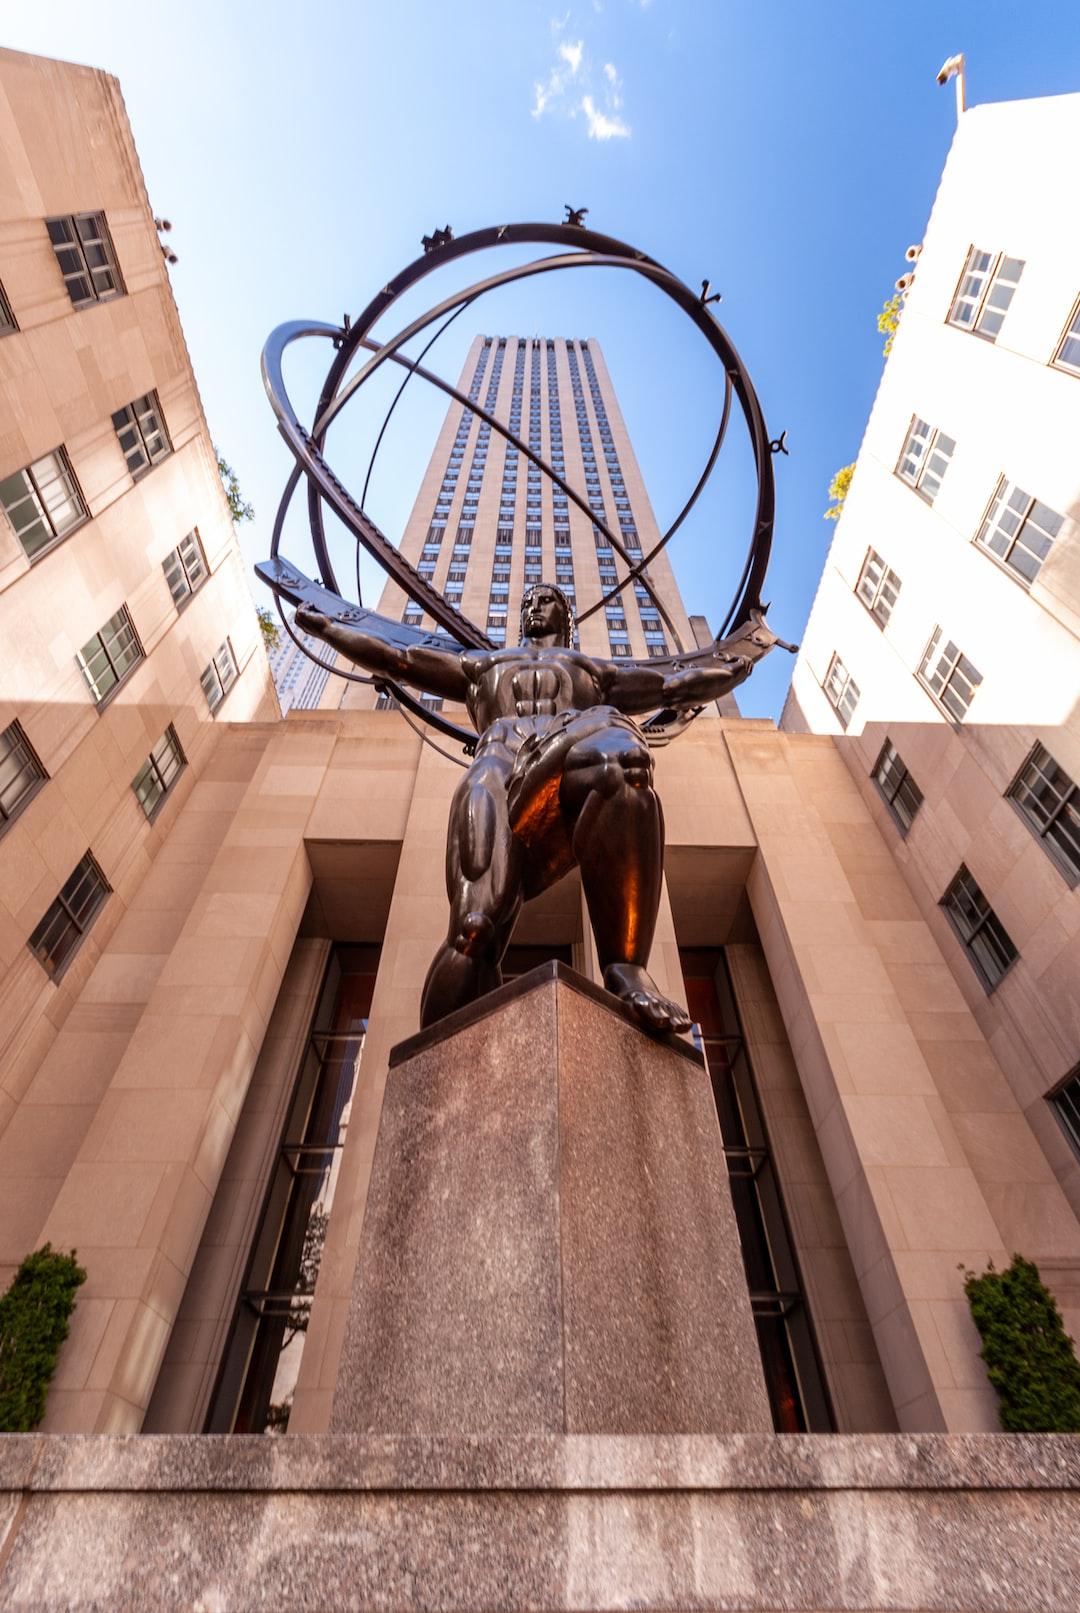 90 Second Bio: John D Rockefeller